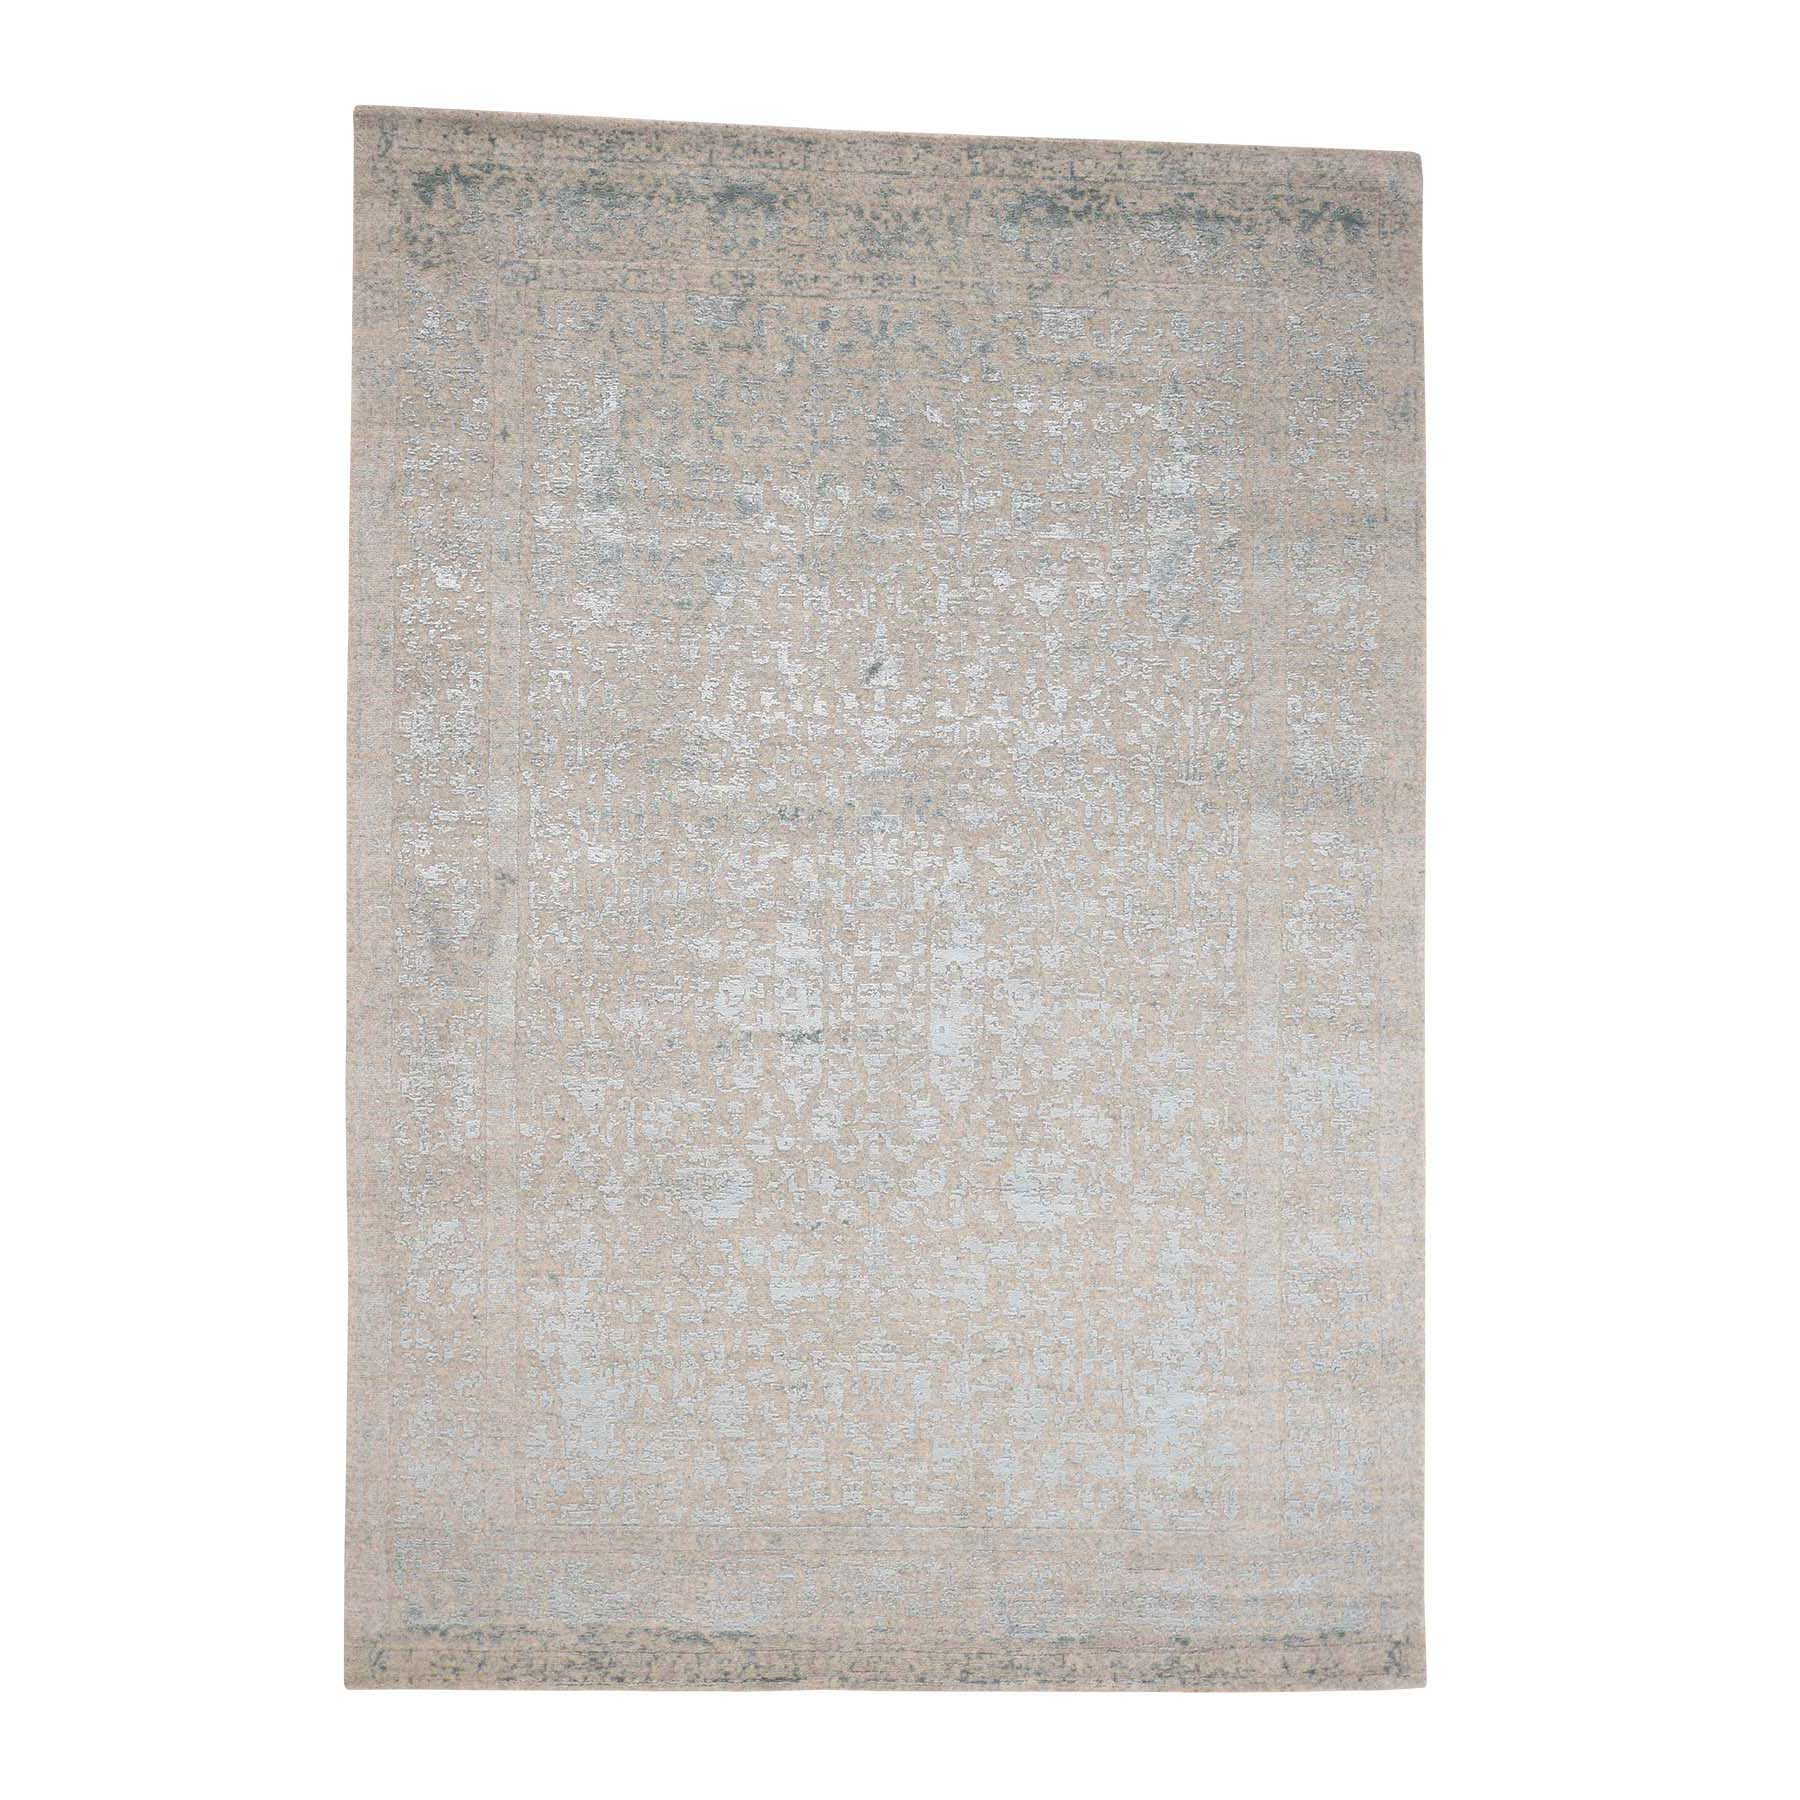 "6'2""x8'10 Hand-Loomed Tree Design Tone on Tone Wool and Silk Oriental Rug"